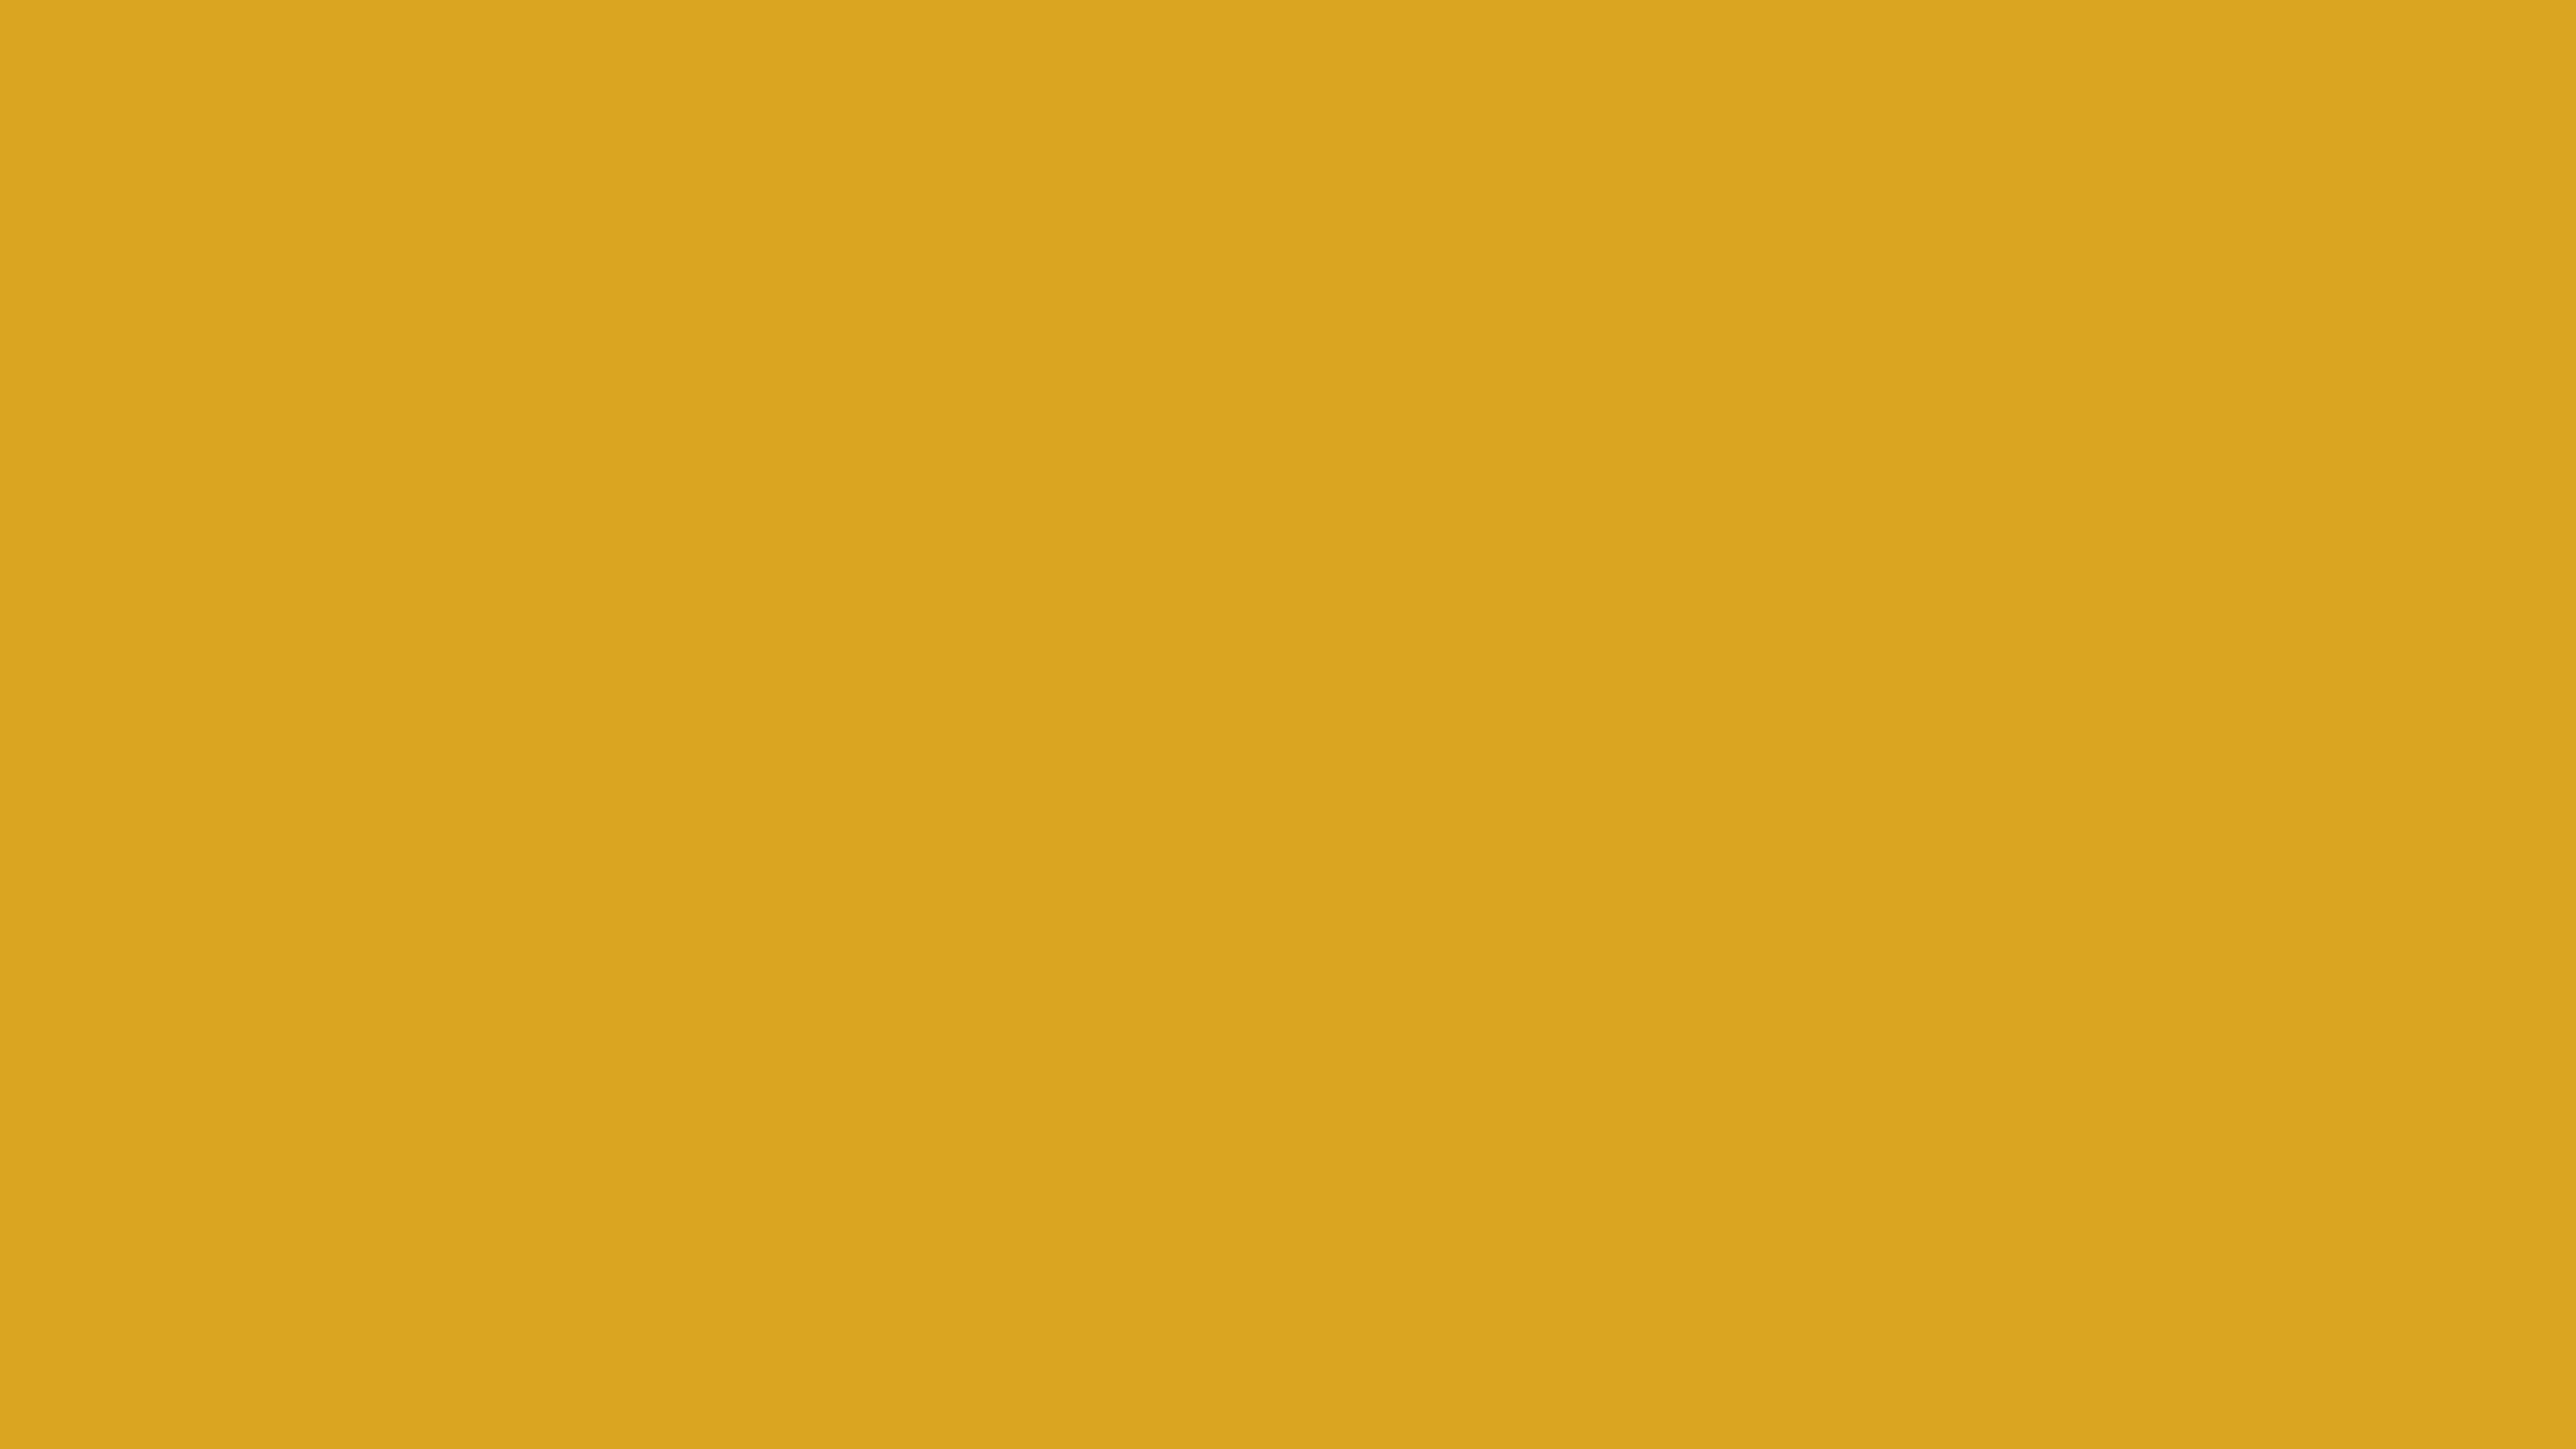 3840x2160 Goldenrod Solid Color Background